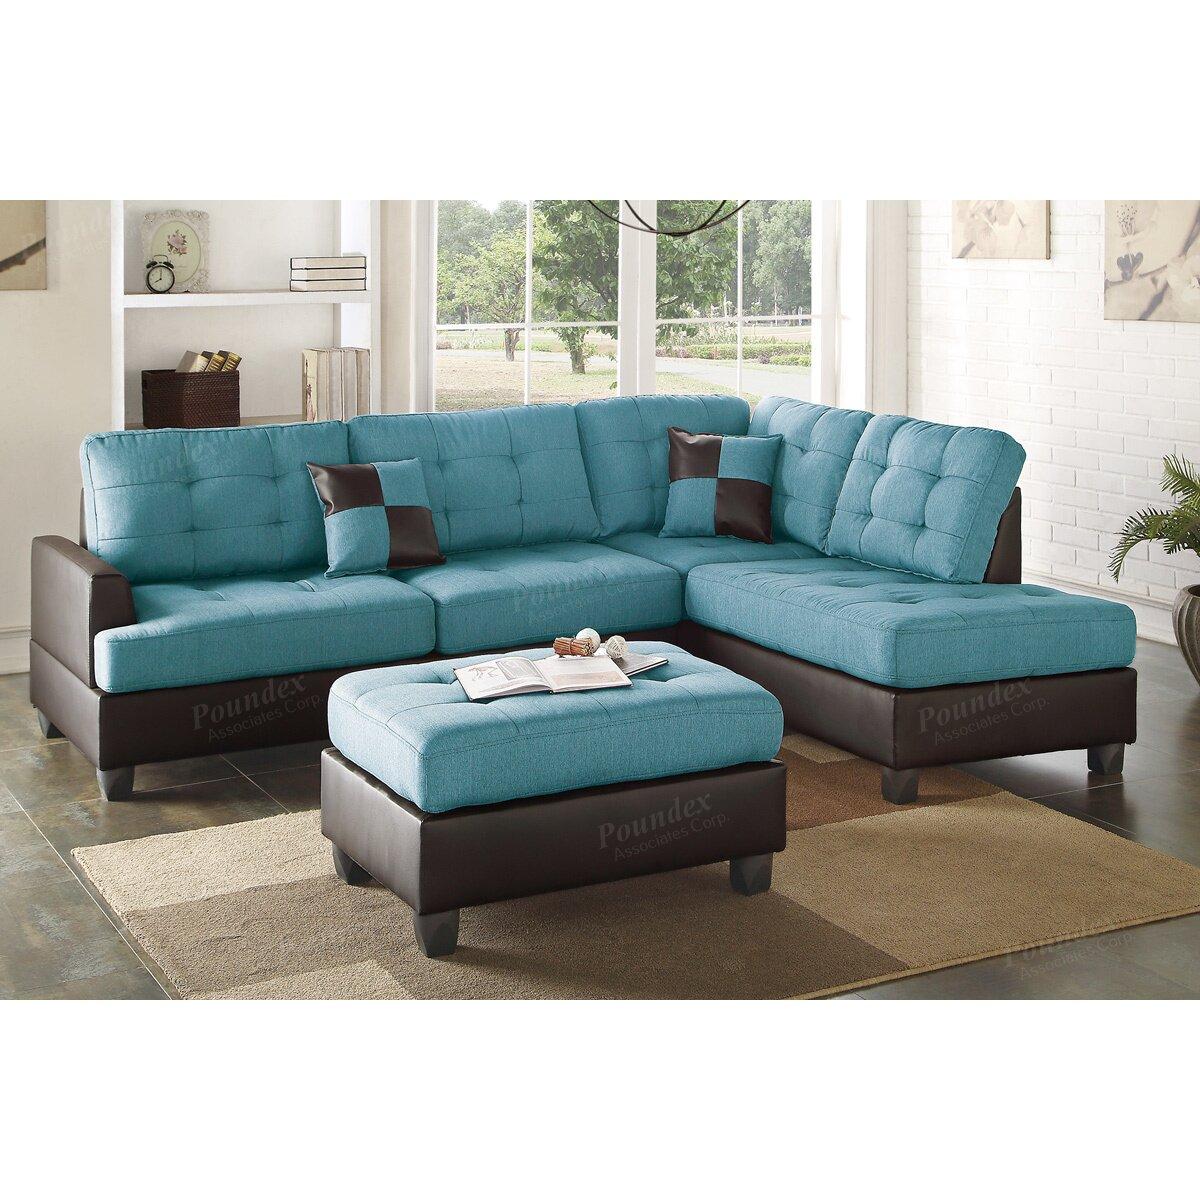 Poundex Sectional White Leather Sofa Chaise: Poundex Bobkona Matthew Reversible Chaise Sectional